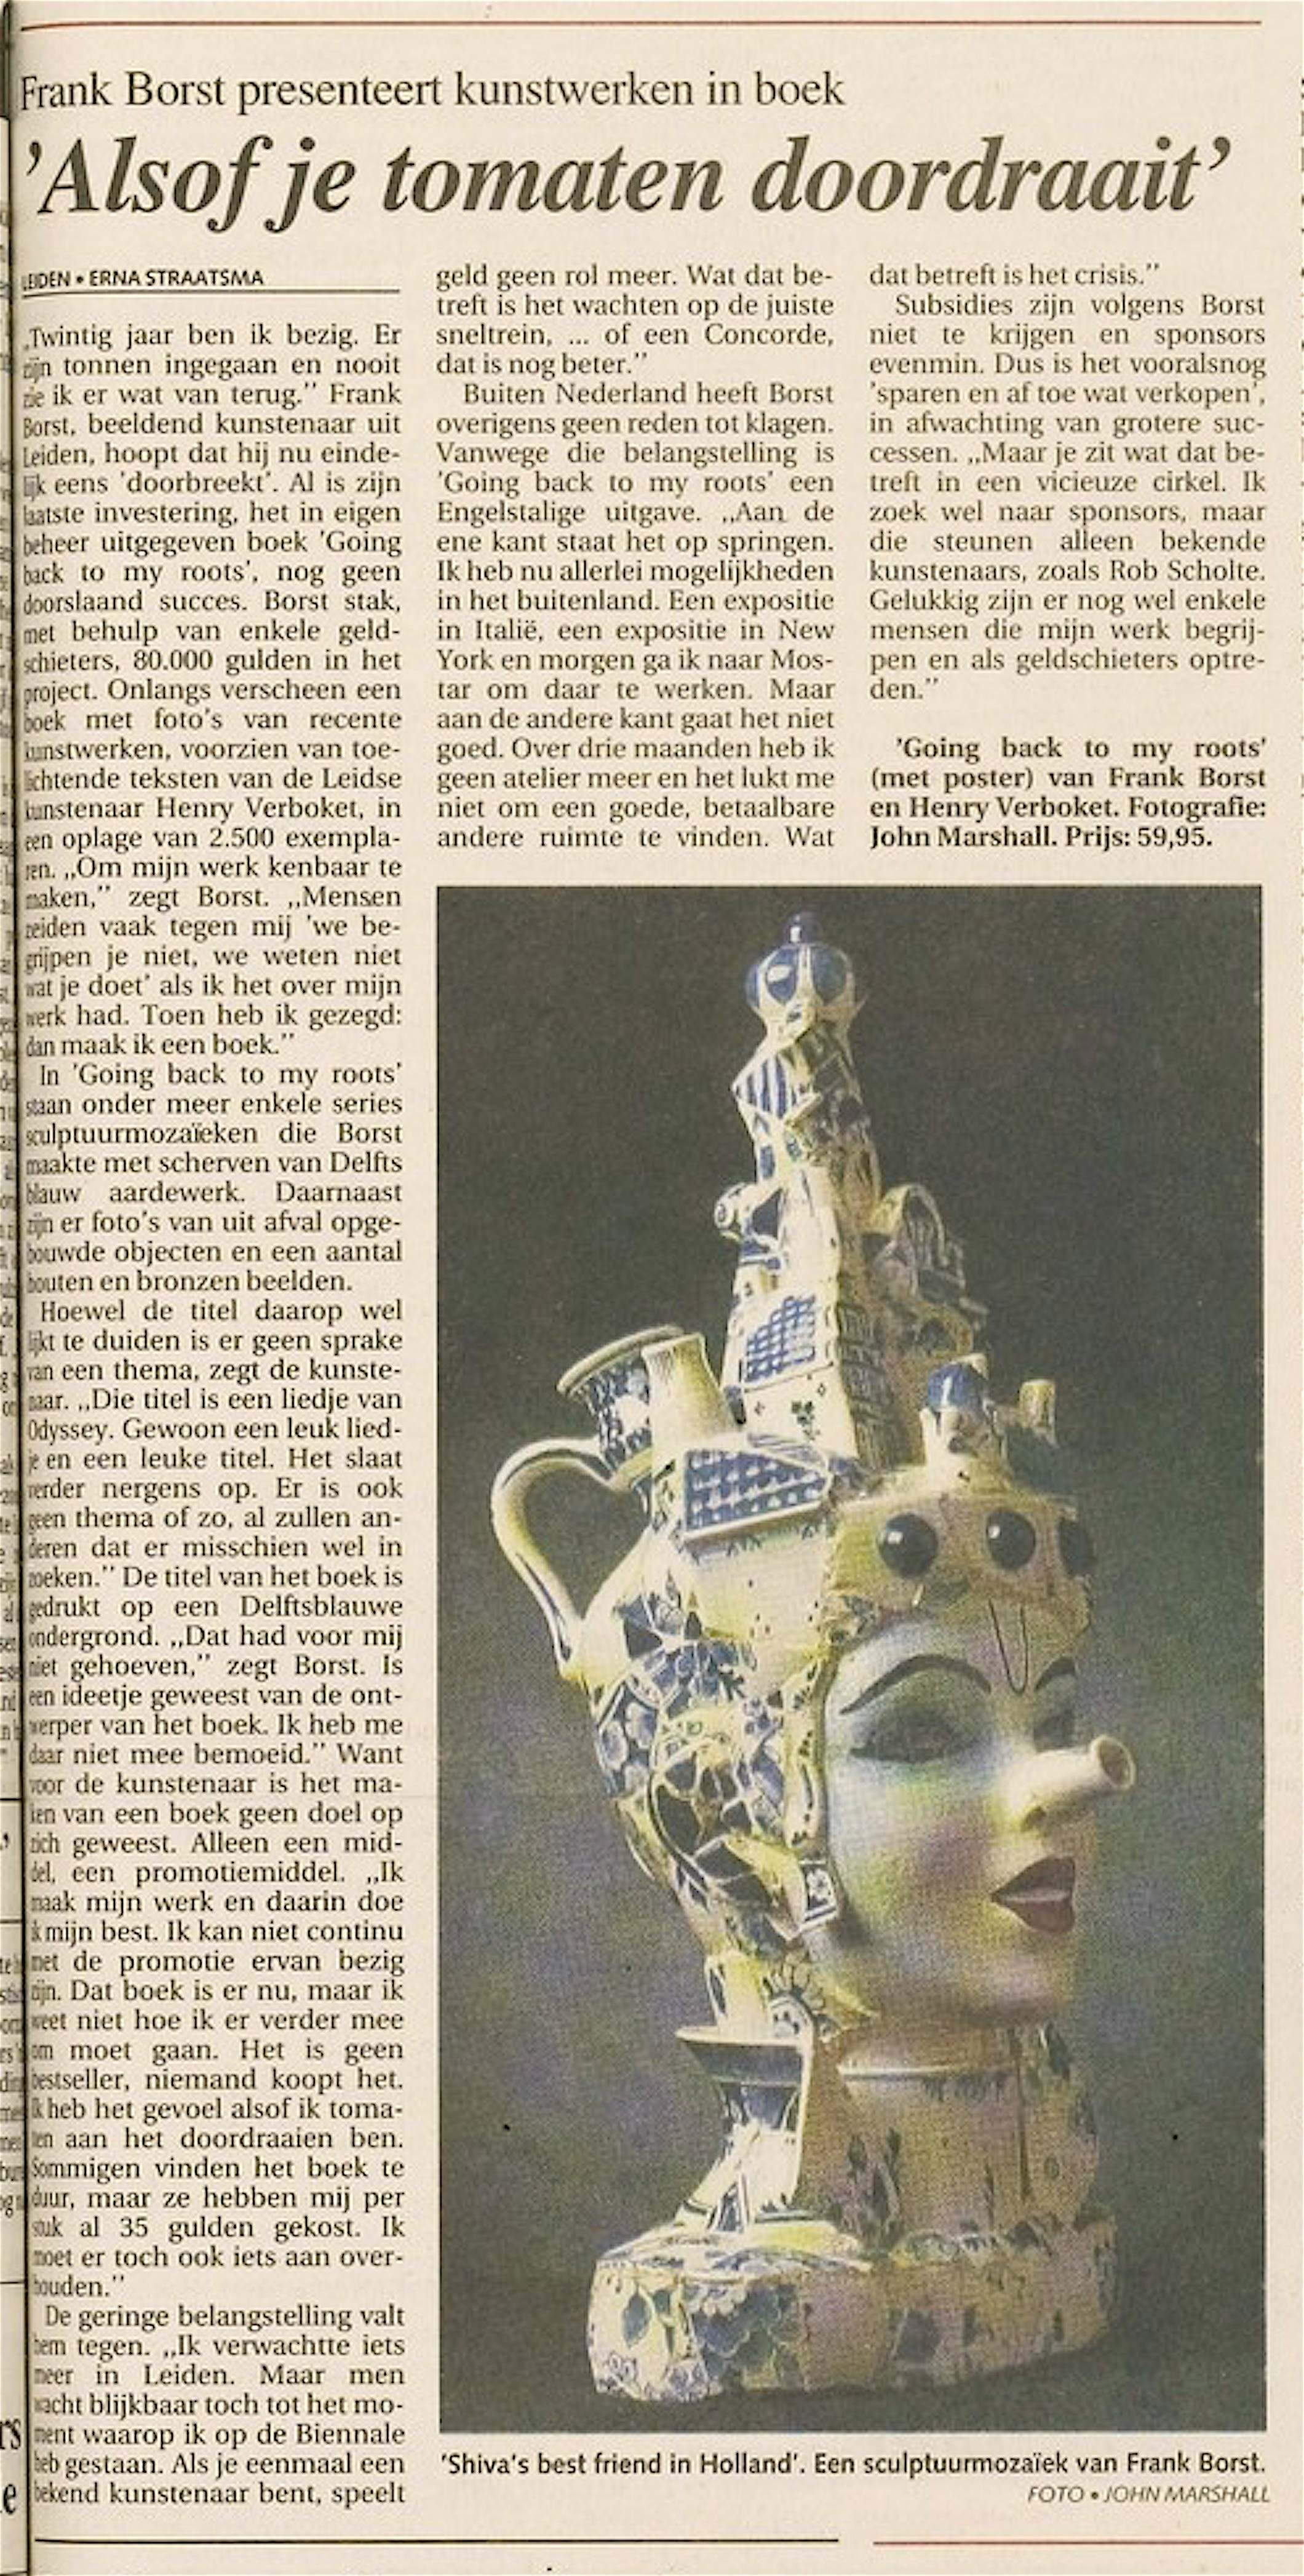 Leidsch Dagblad   20 juli 1996   pagina 15 (15/36)